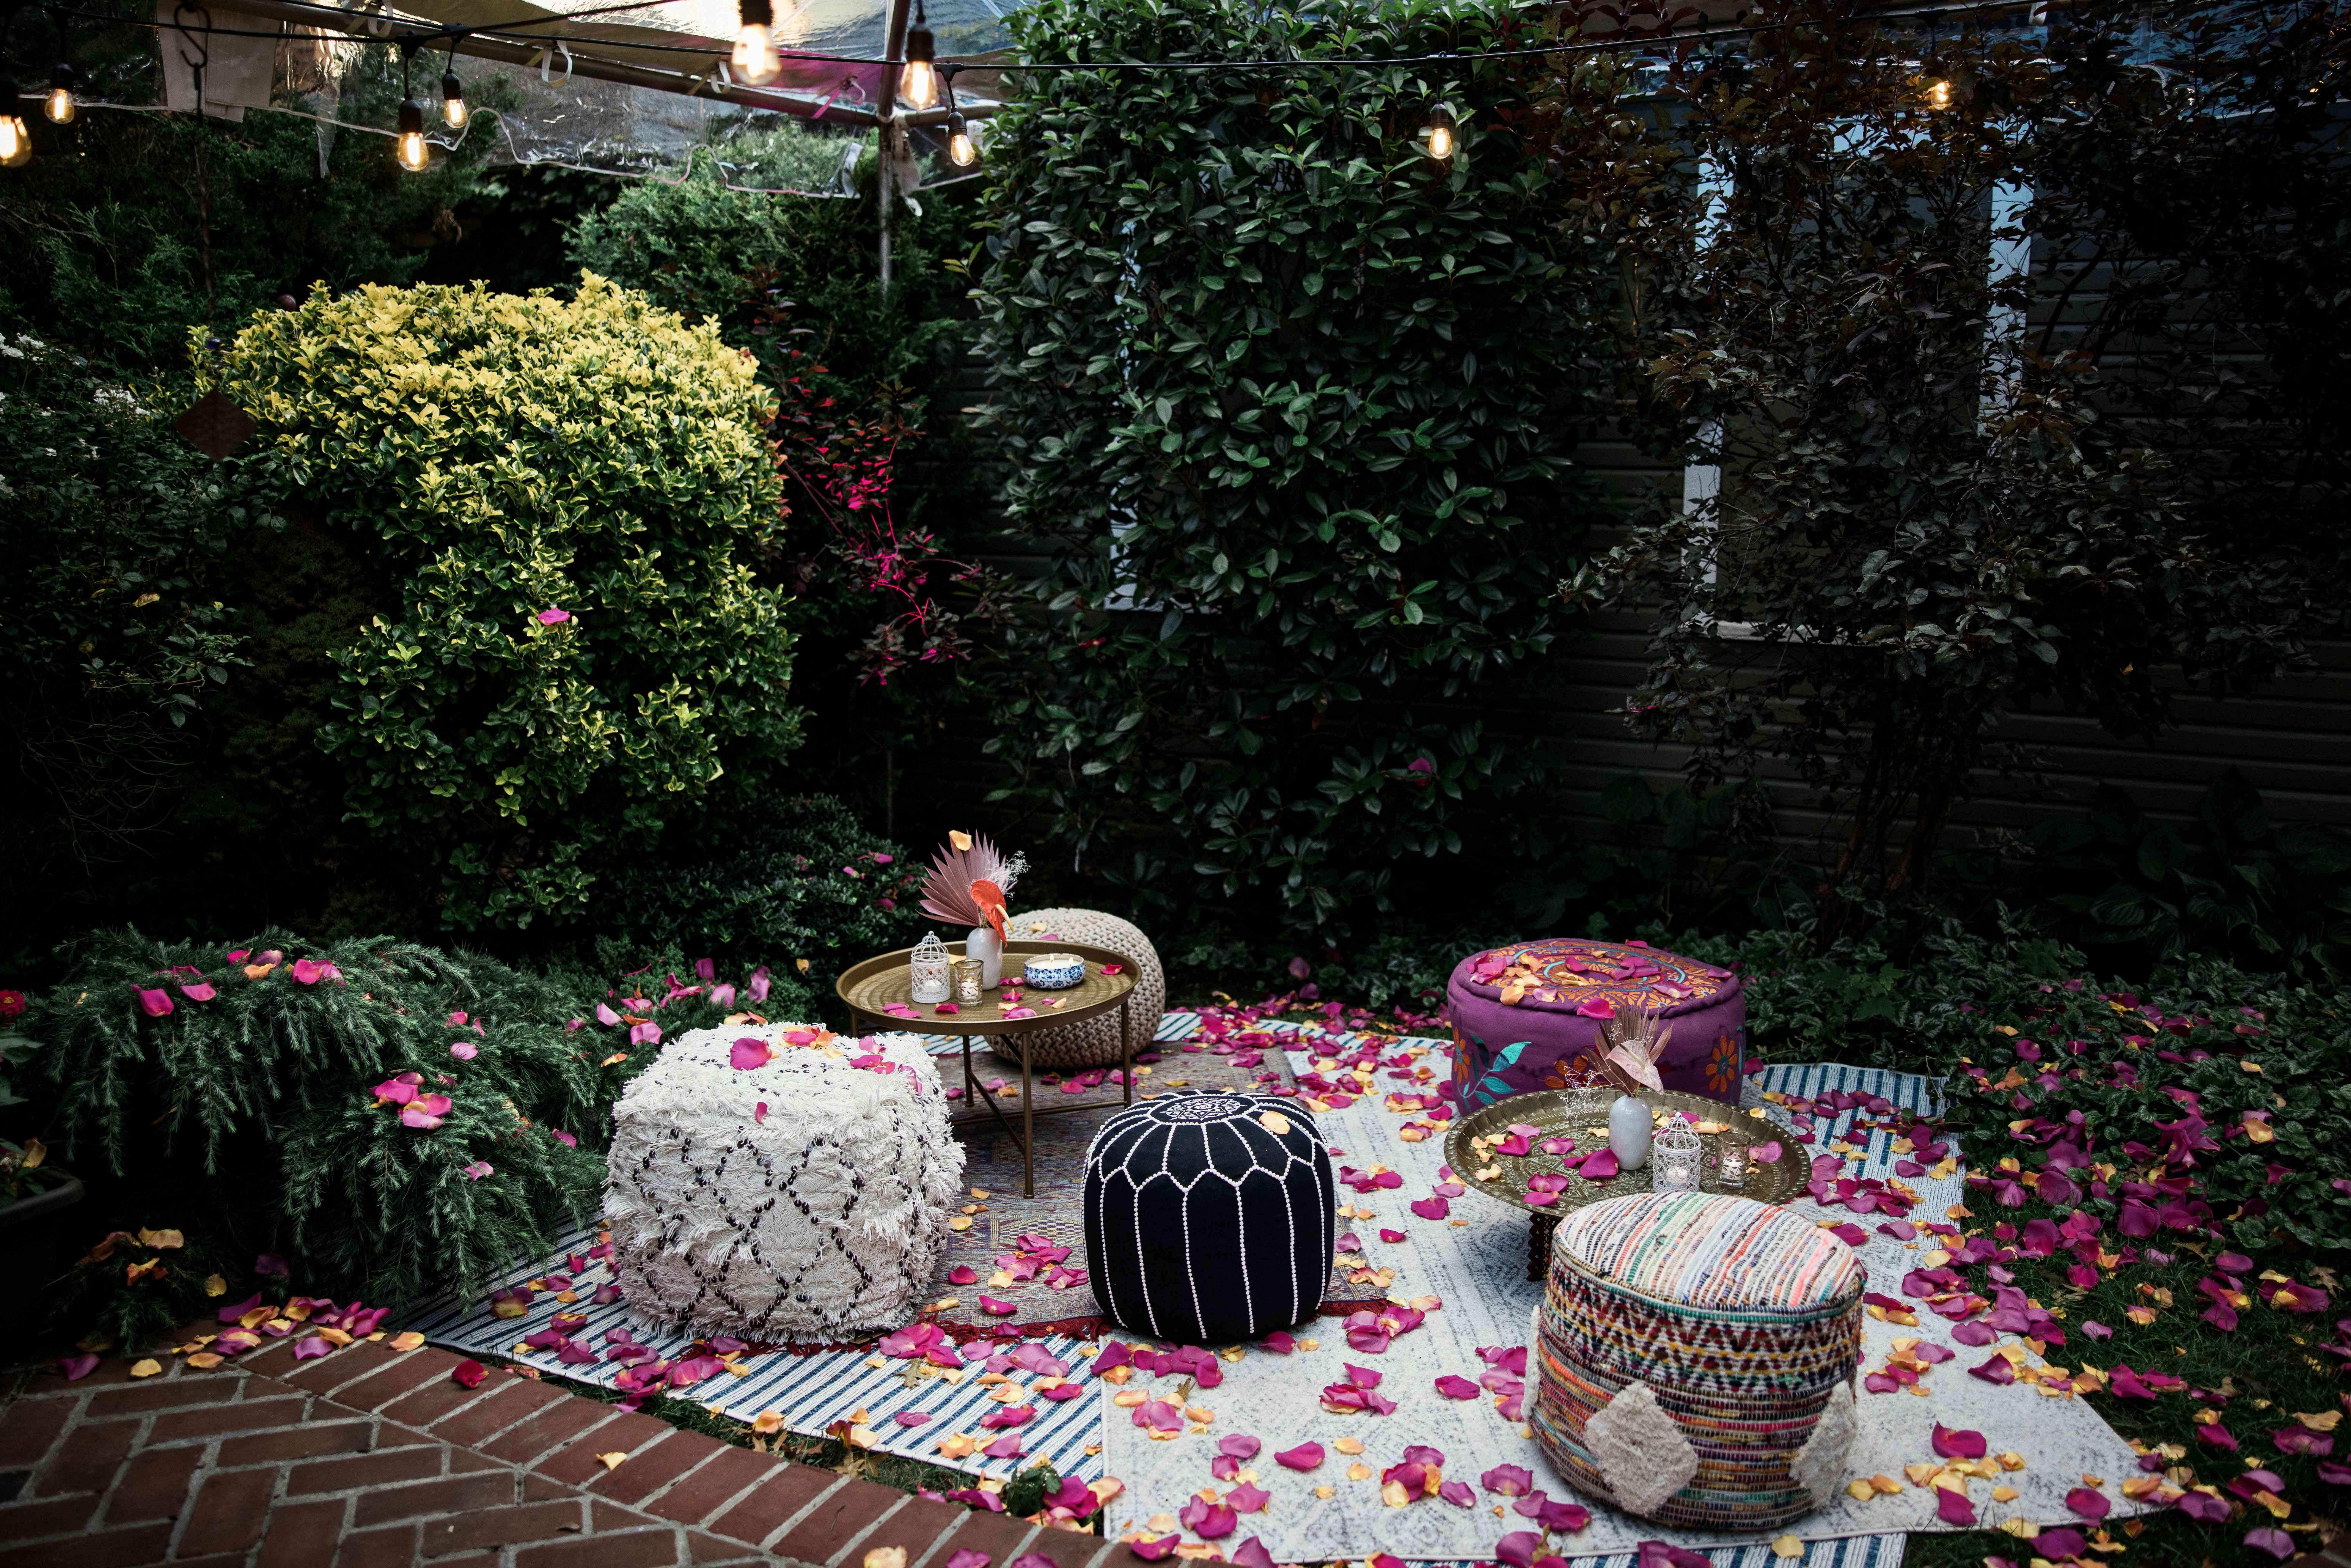 A backyard floor seating arrangement